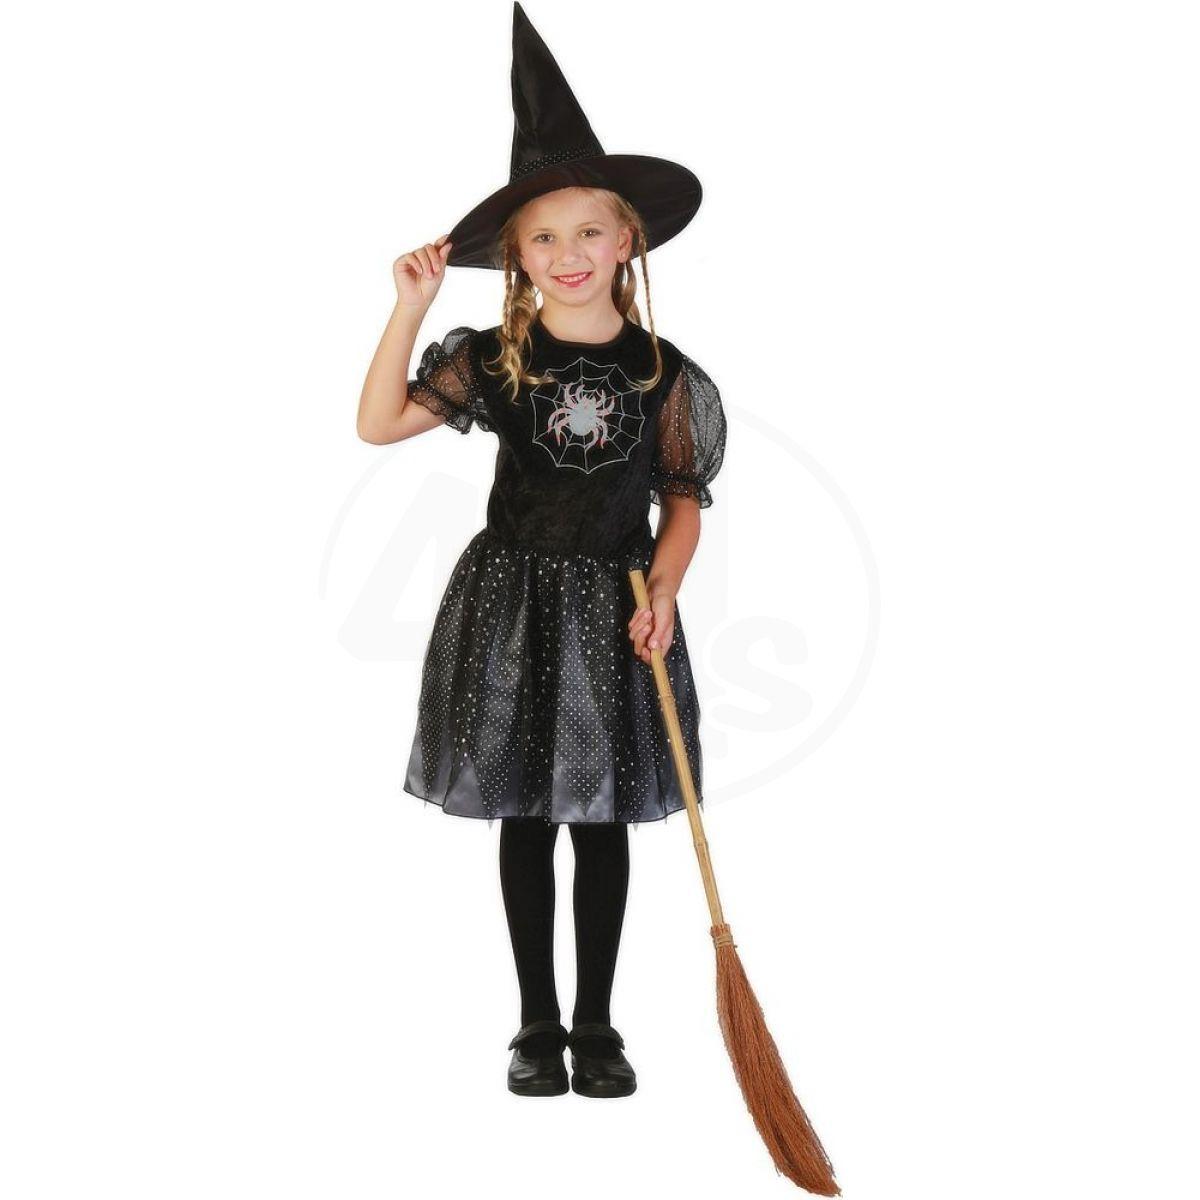 a69d6b654feb Made Dětský kostým Čarodějnice 120-130 cm